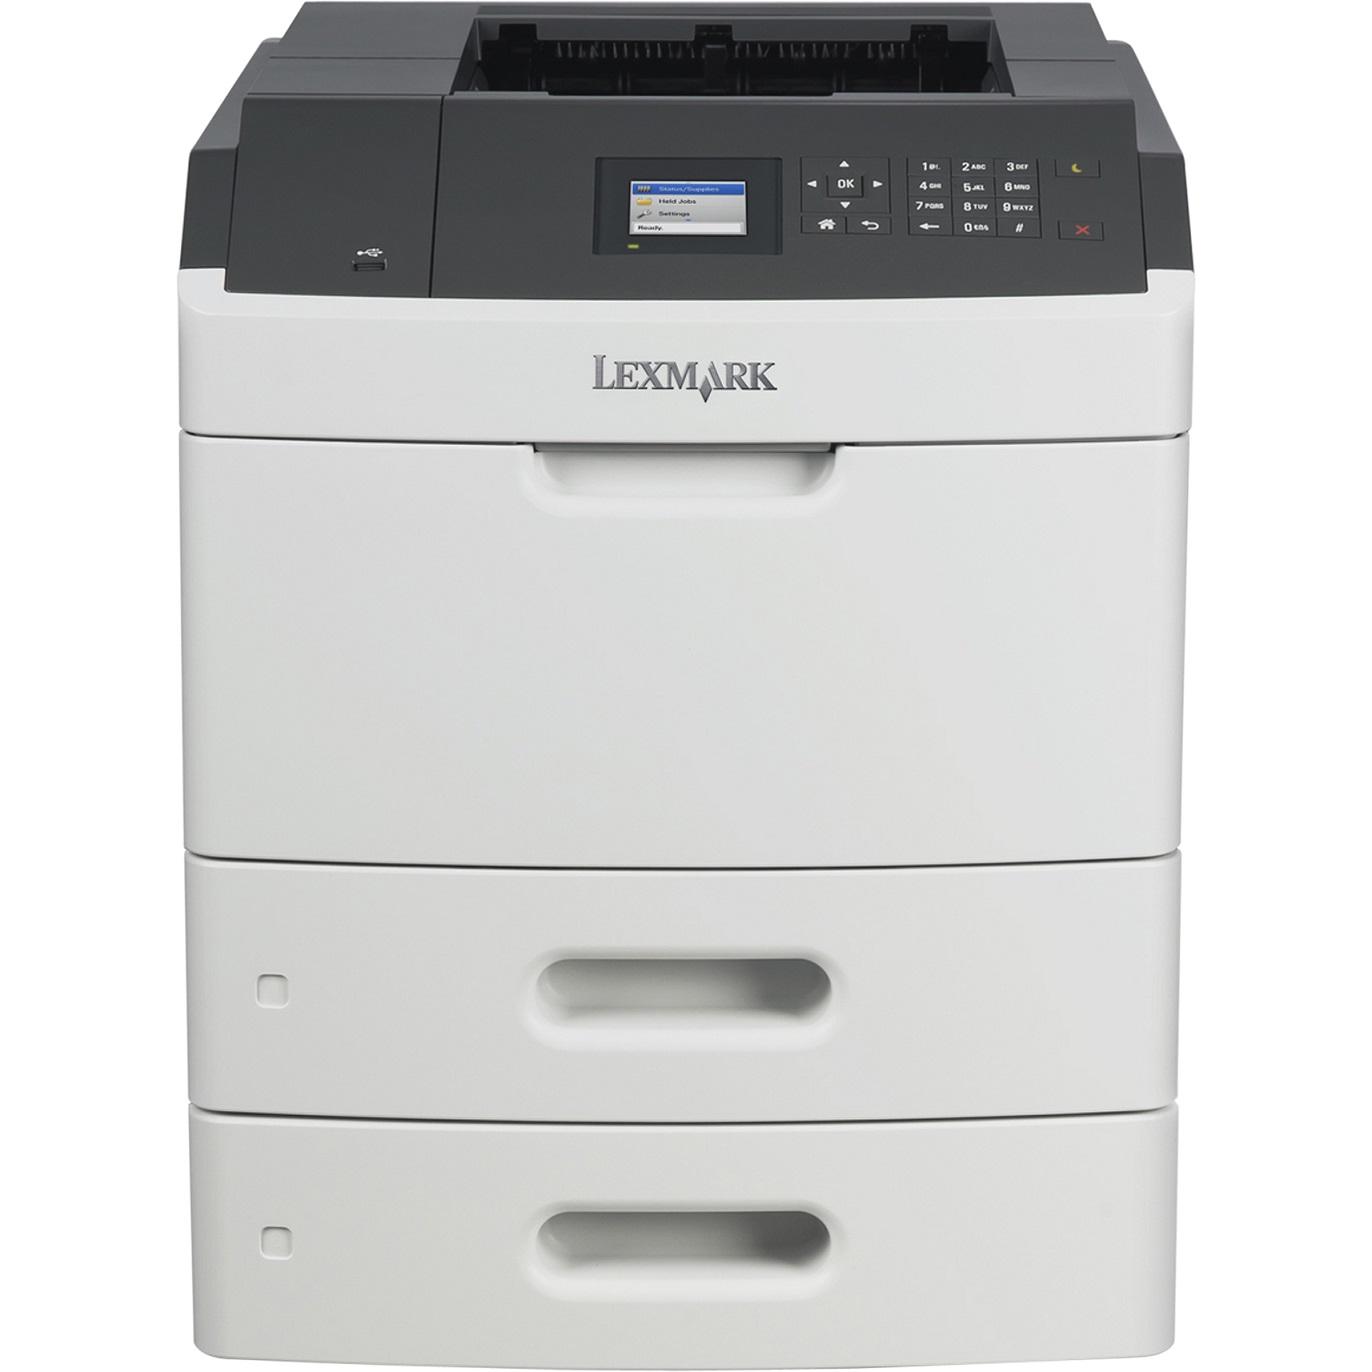 Lexmark MS810dtn,A4,1200x1200dpi,52ppm,duplex,LAN